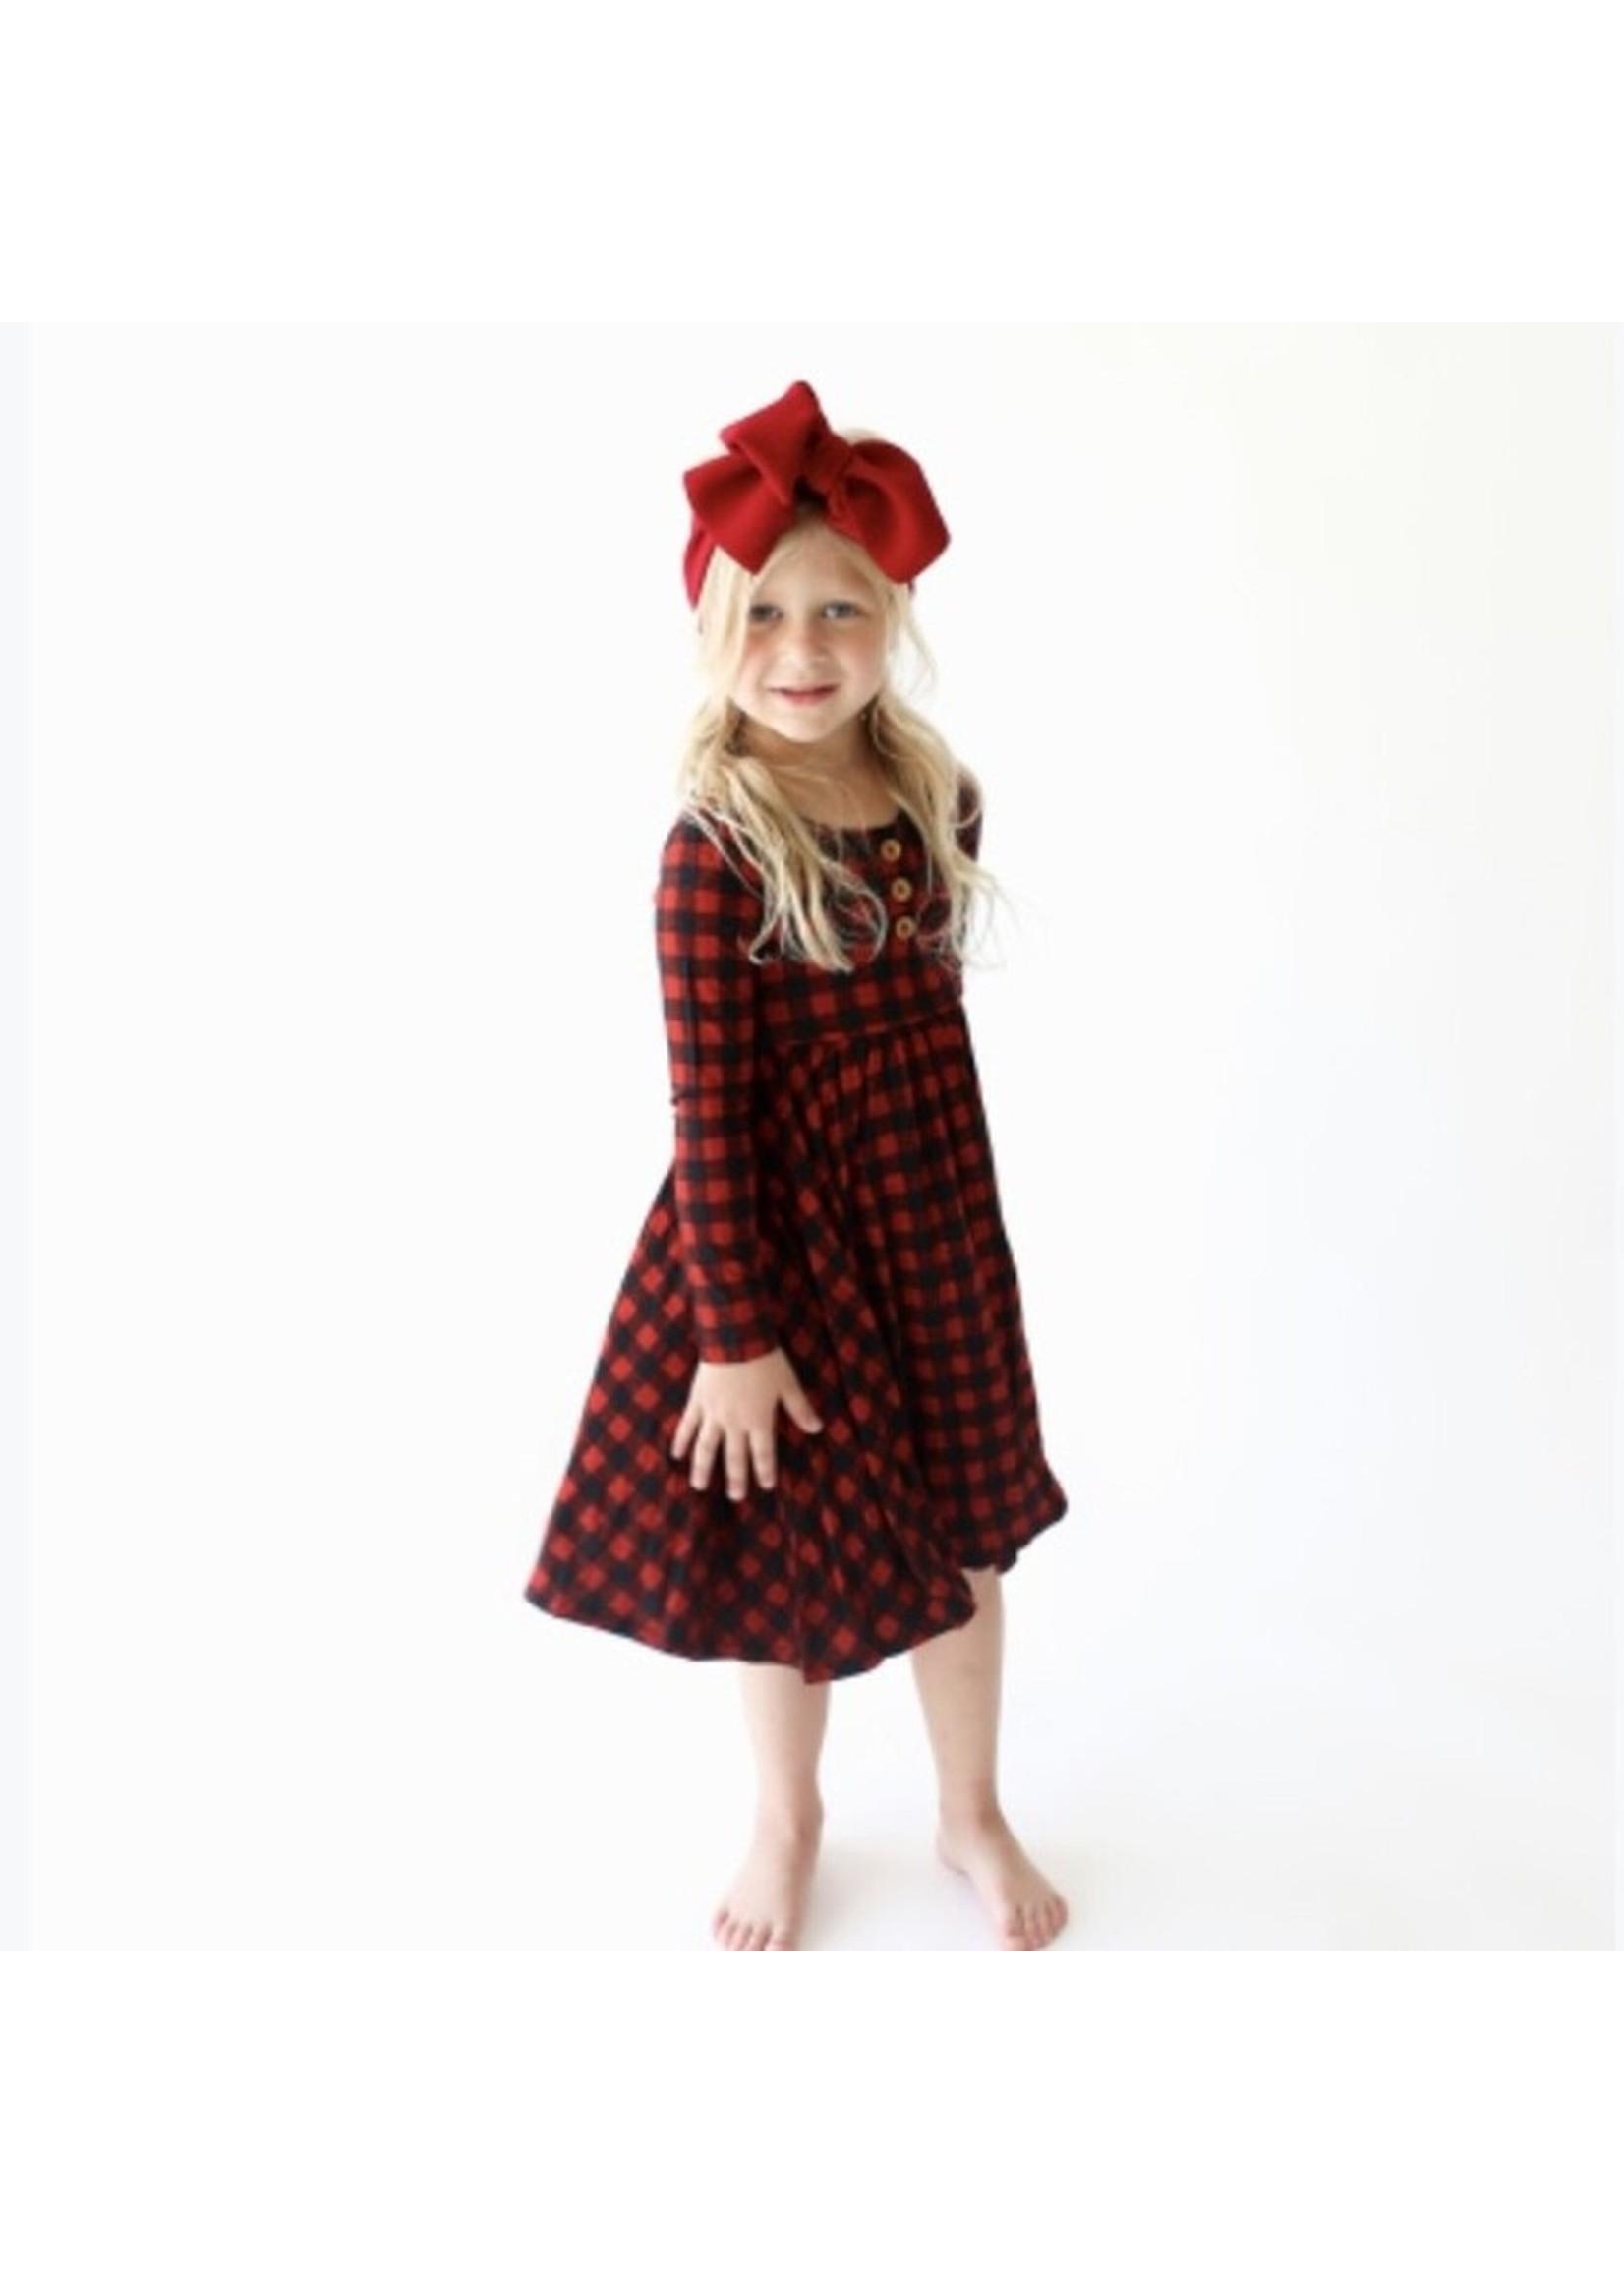 posh peanut Grayson Long Sleeve Twirl Dress 2T